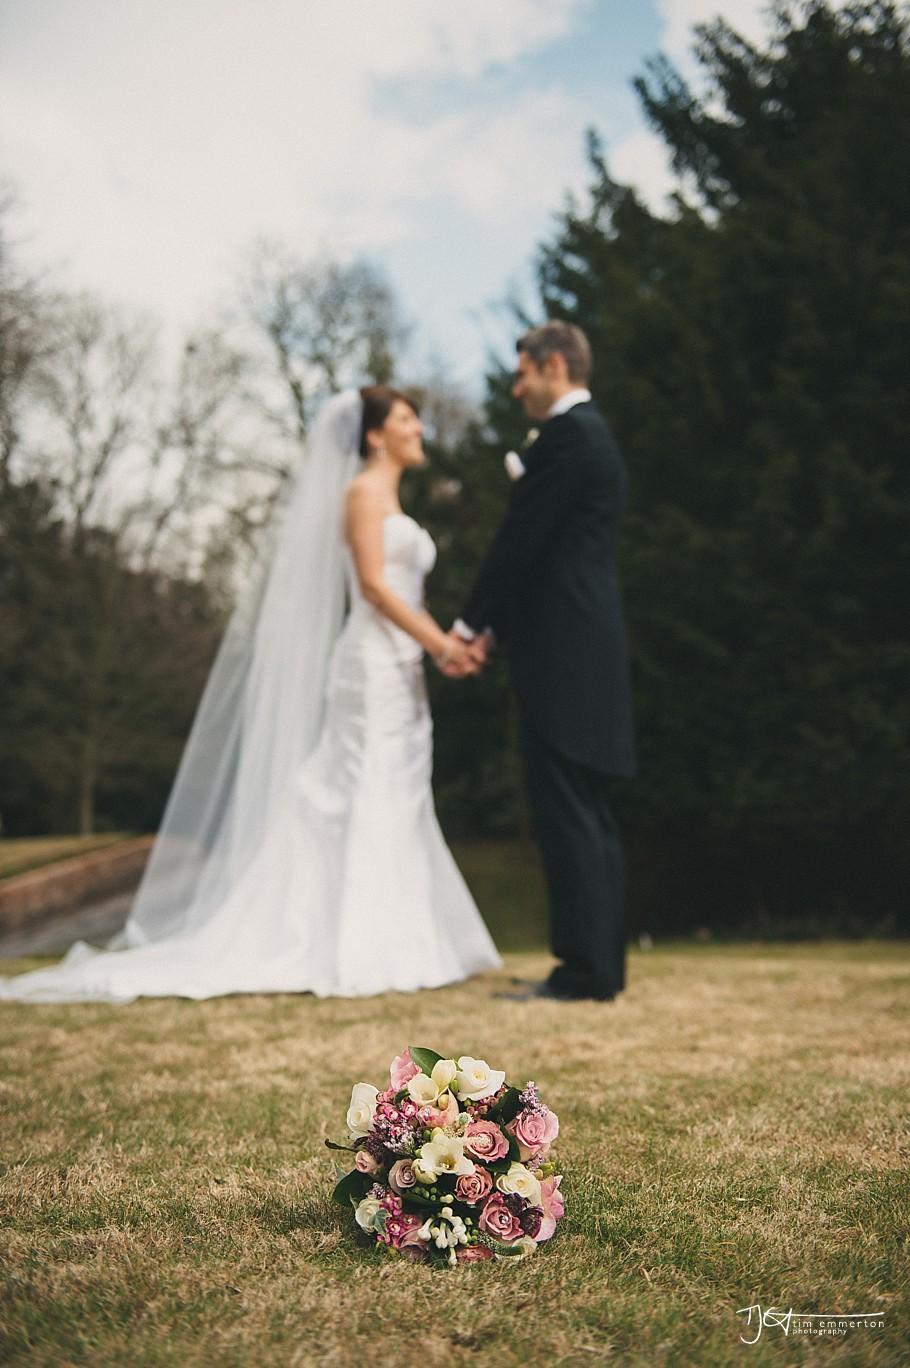 Samlesbury-Hall-Wedding-Photographer-139.jpg